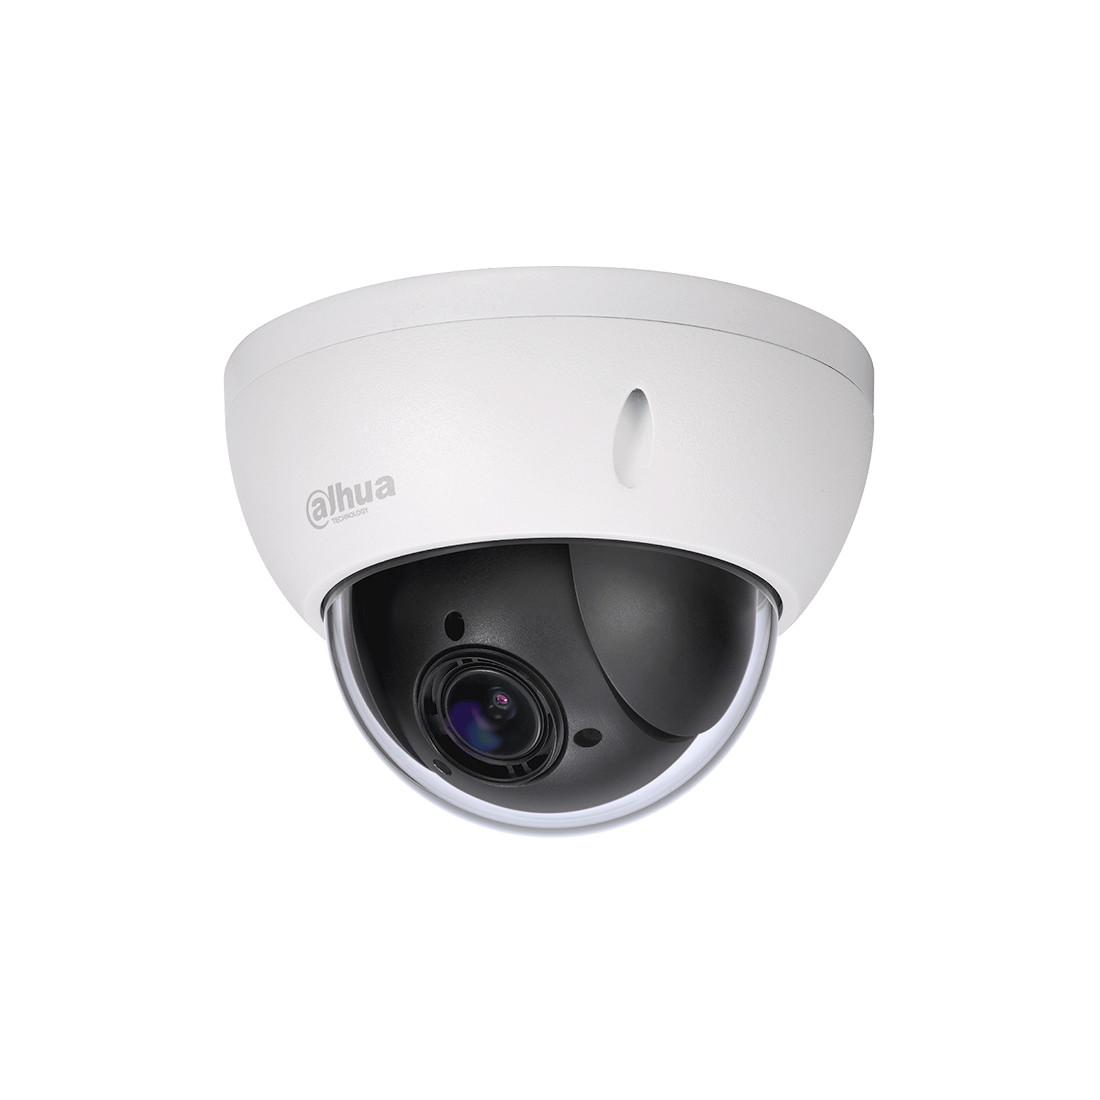 Dahua Поворотная Speed Dome сетевая камера DH-SD22204T-GN